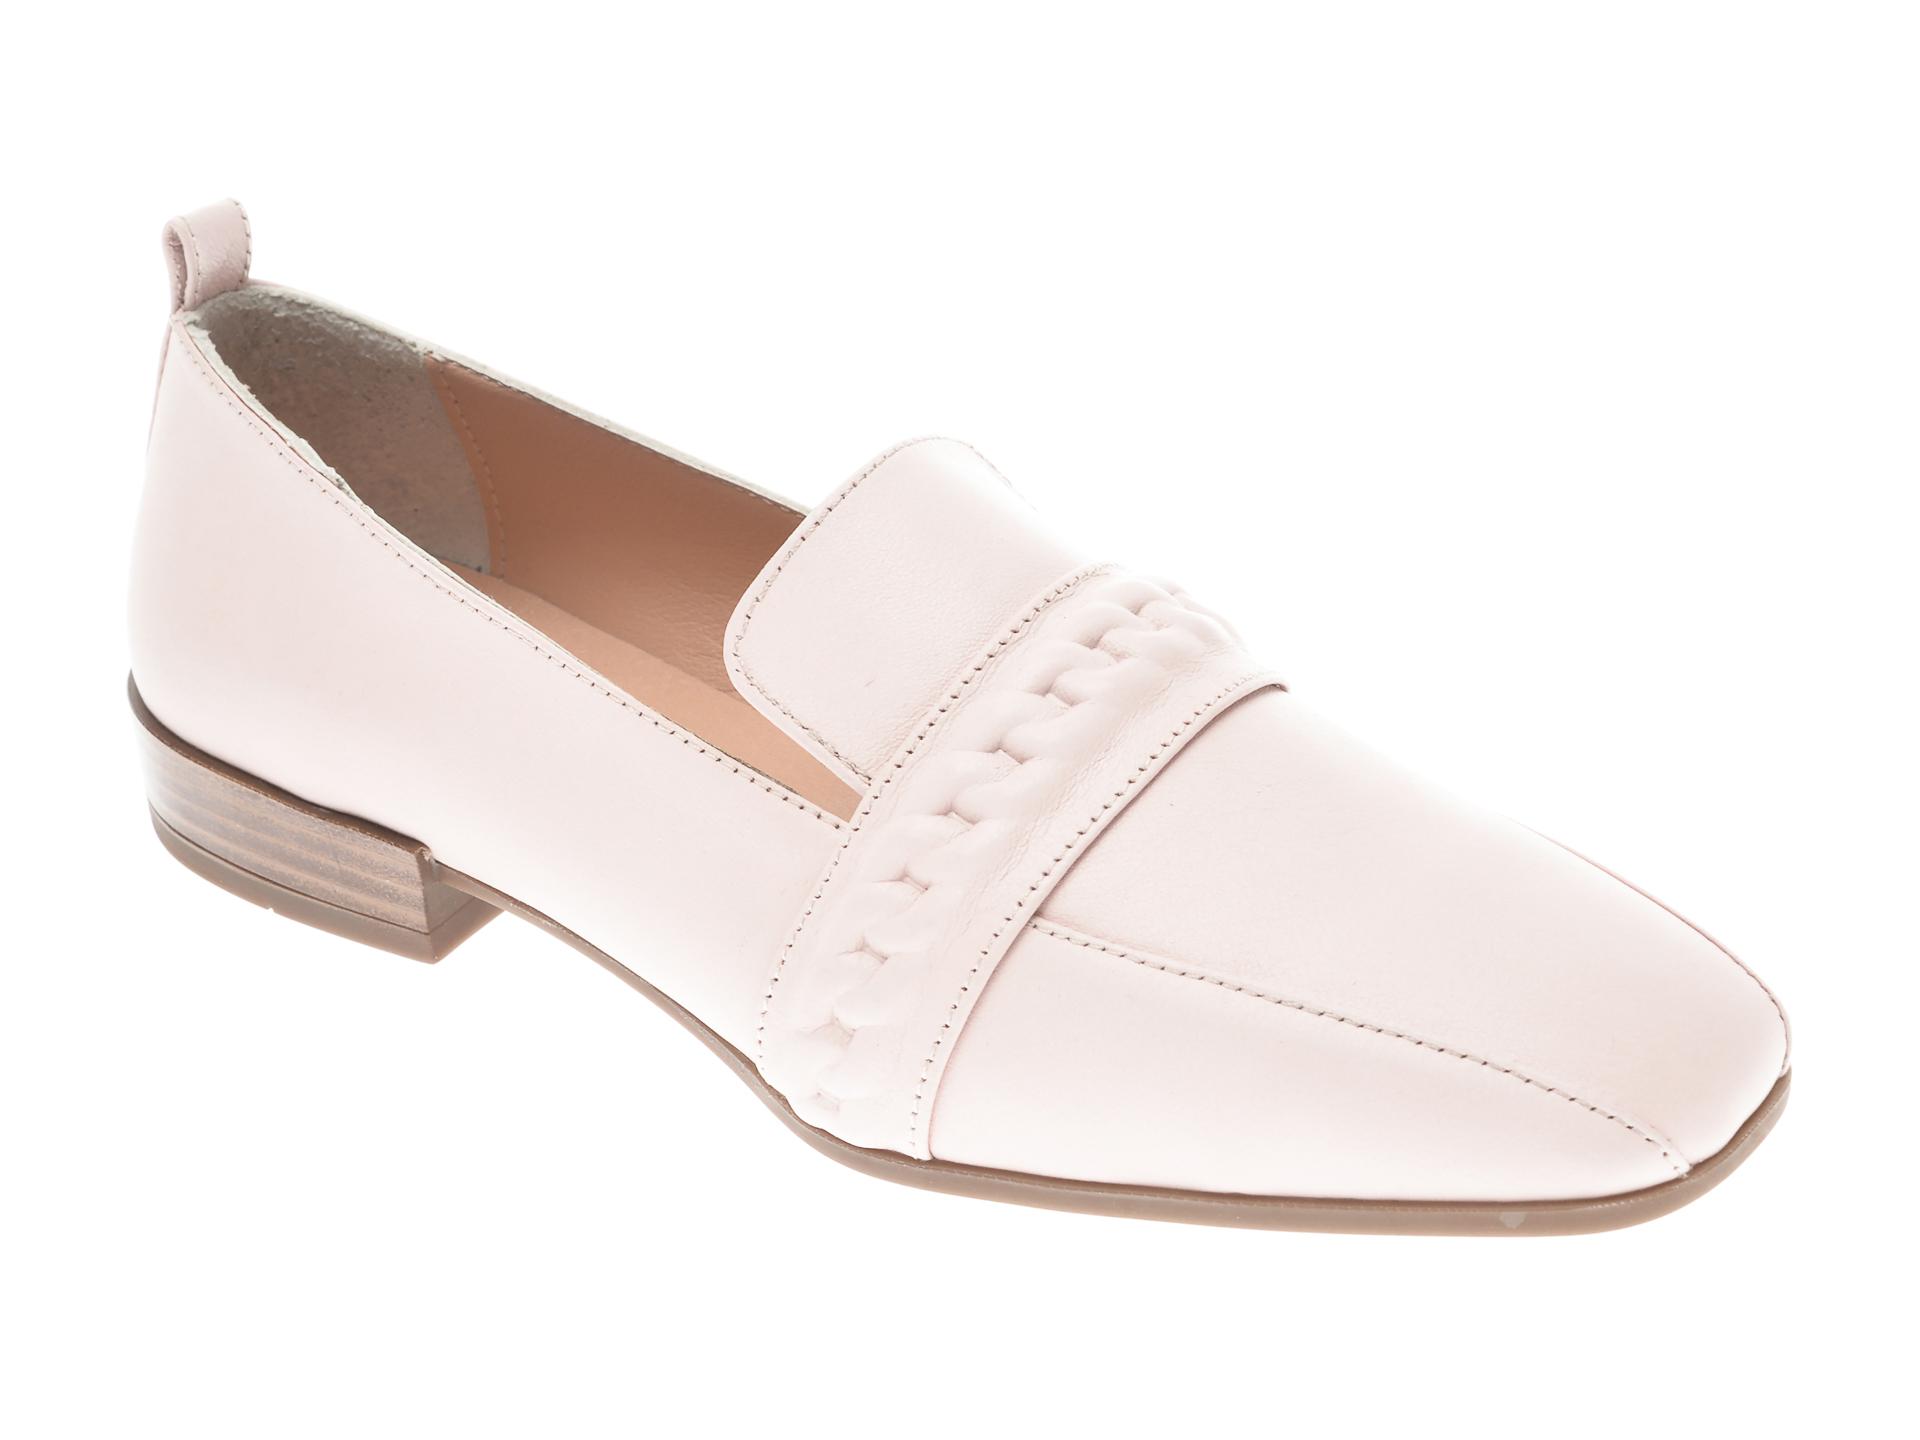 Pantofi Flavia Passini Roz, 22020, Din Piele Naturala